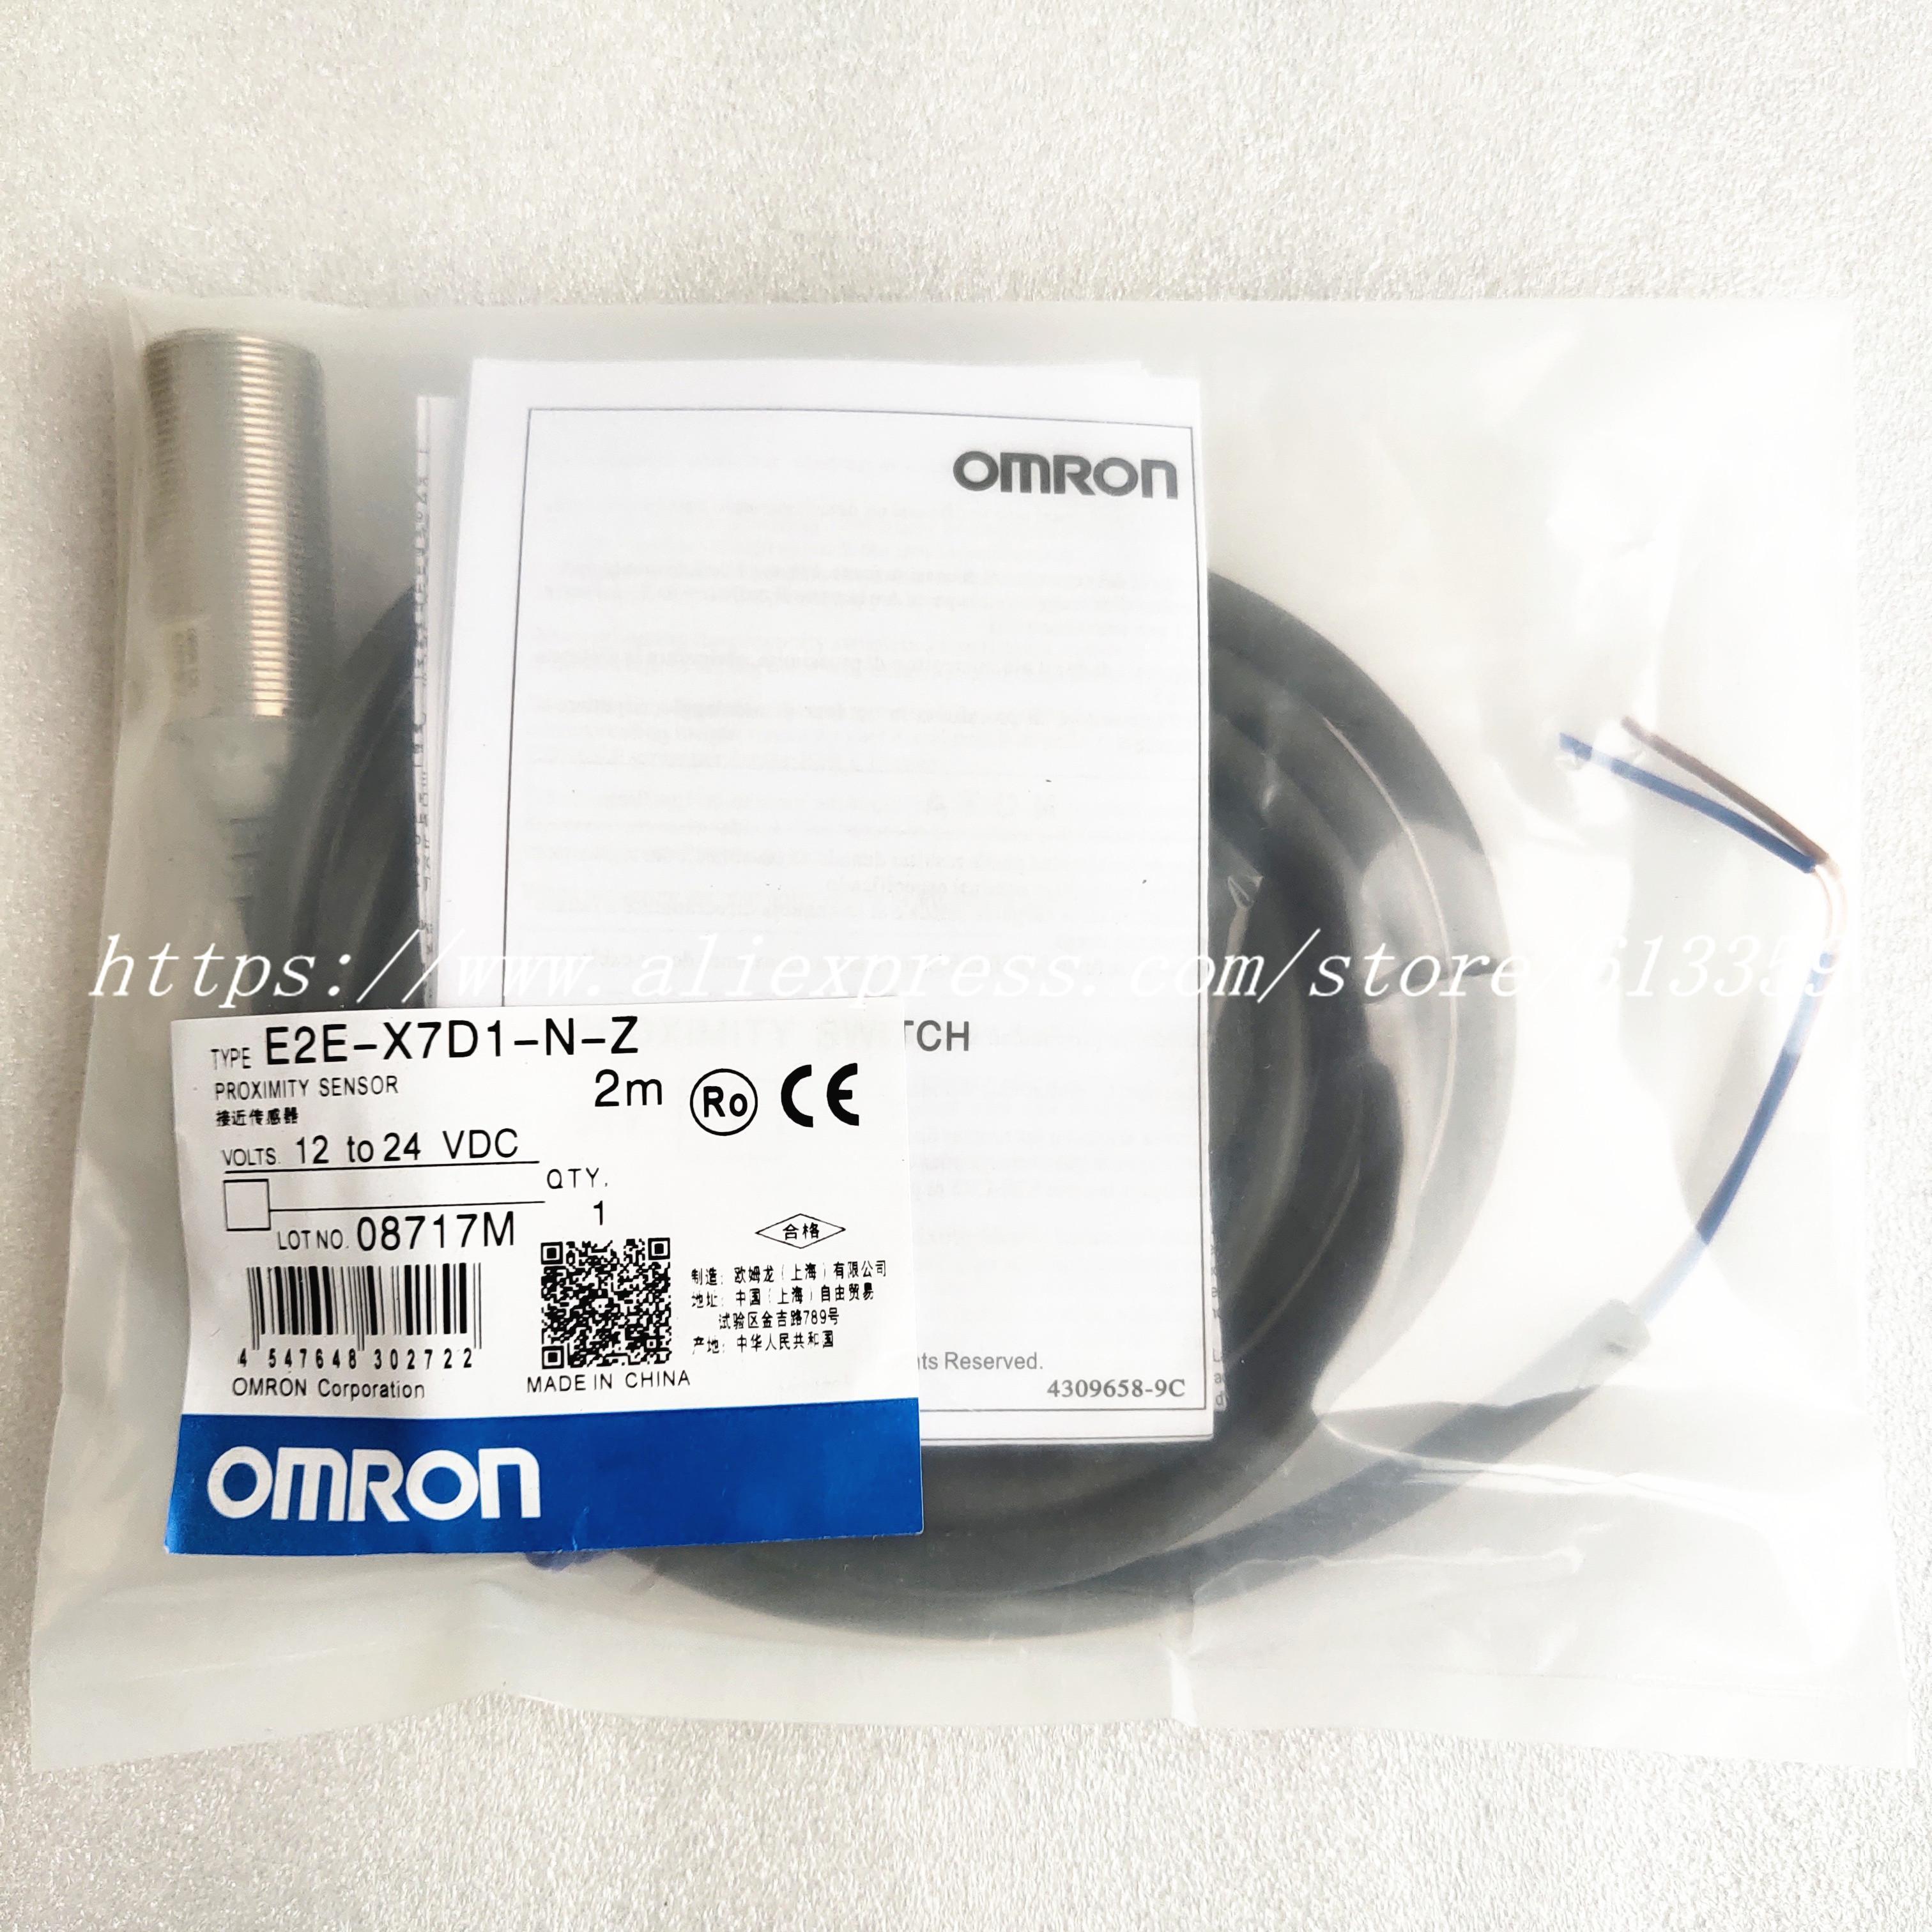 New OMRON E2E-X3D1-N-Z Proximity Switch *S#